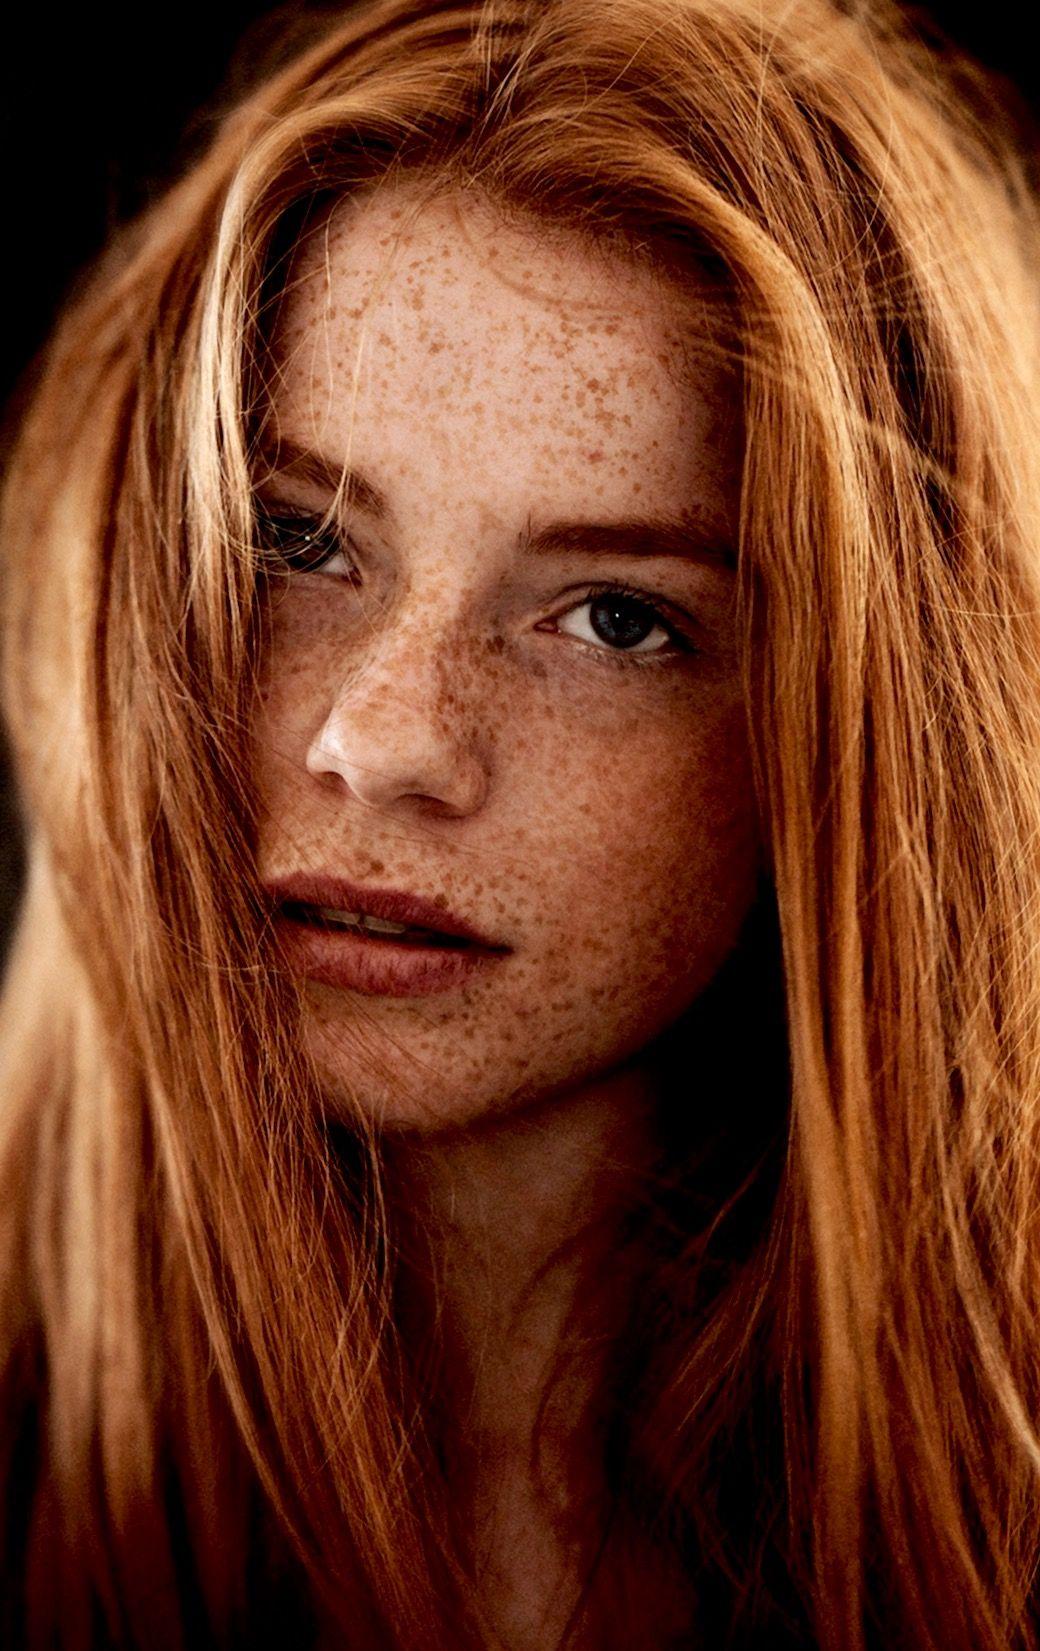 Sommersprossen rote haare